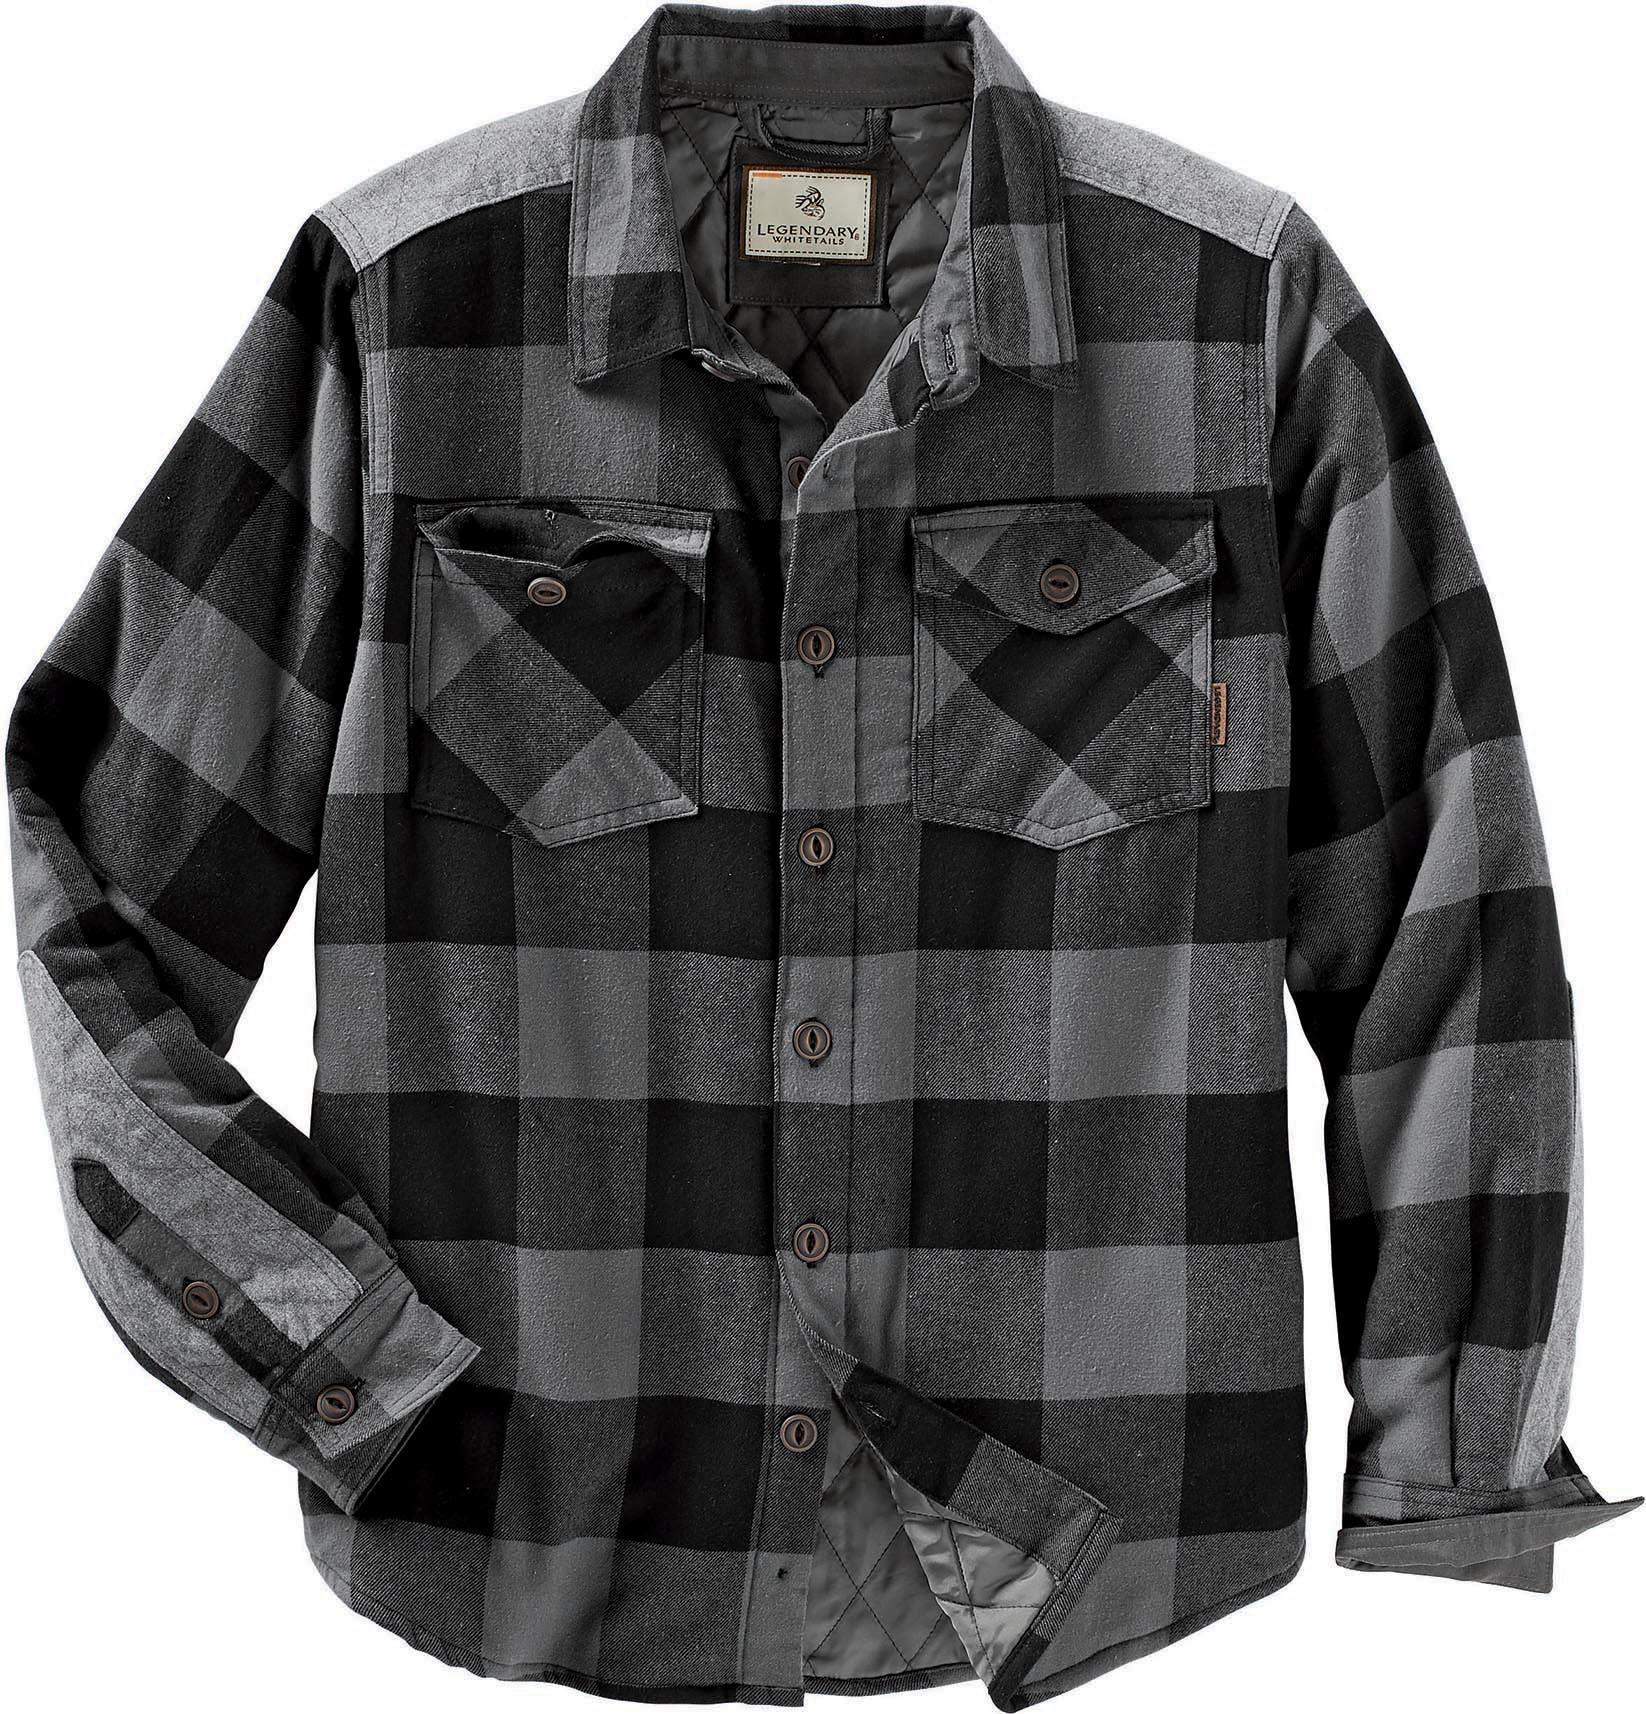 Legendary Whitetails mens Woodsman Heavyweight Quilted Shirt Jacket